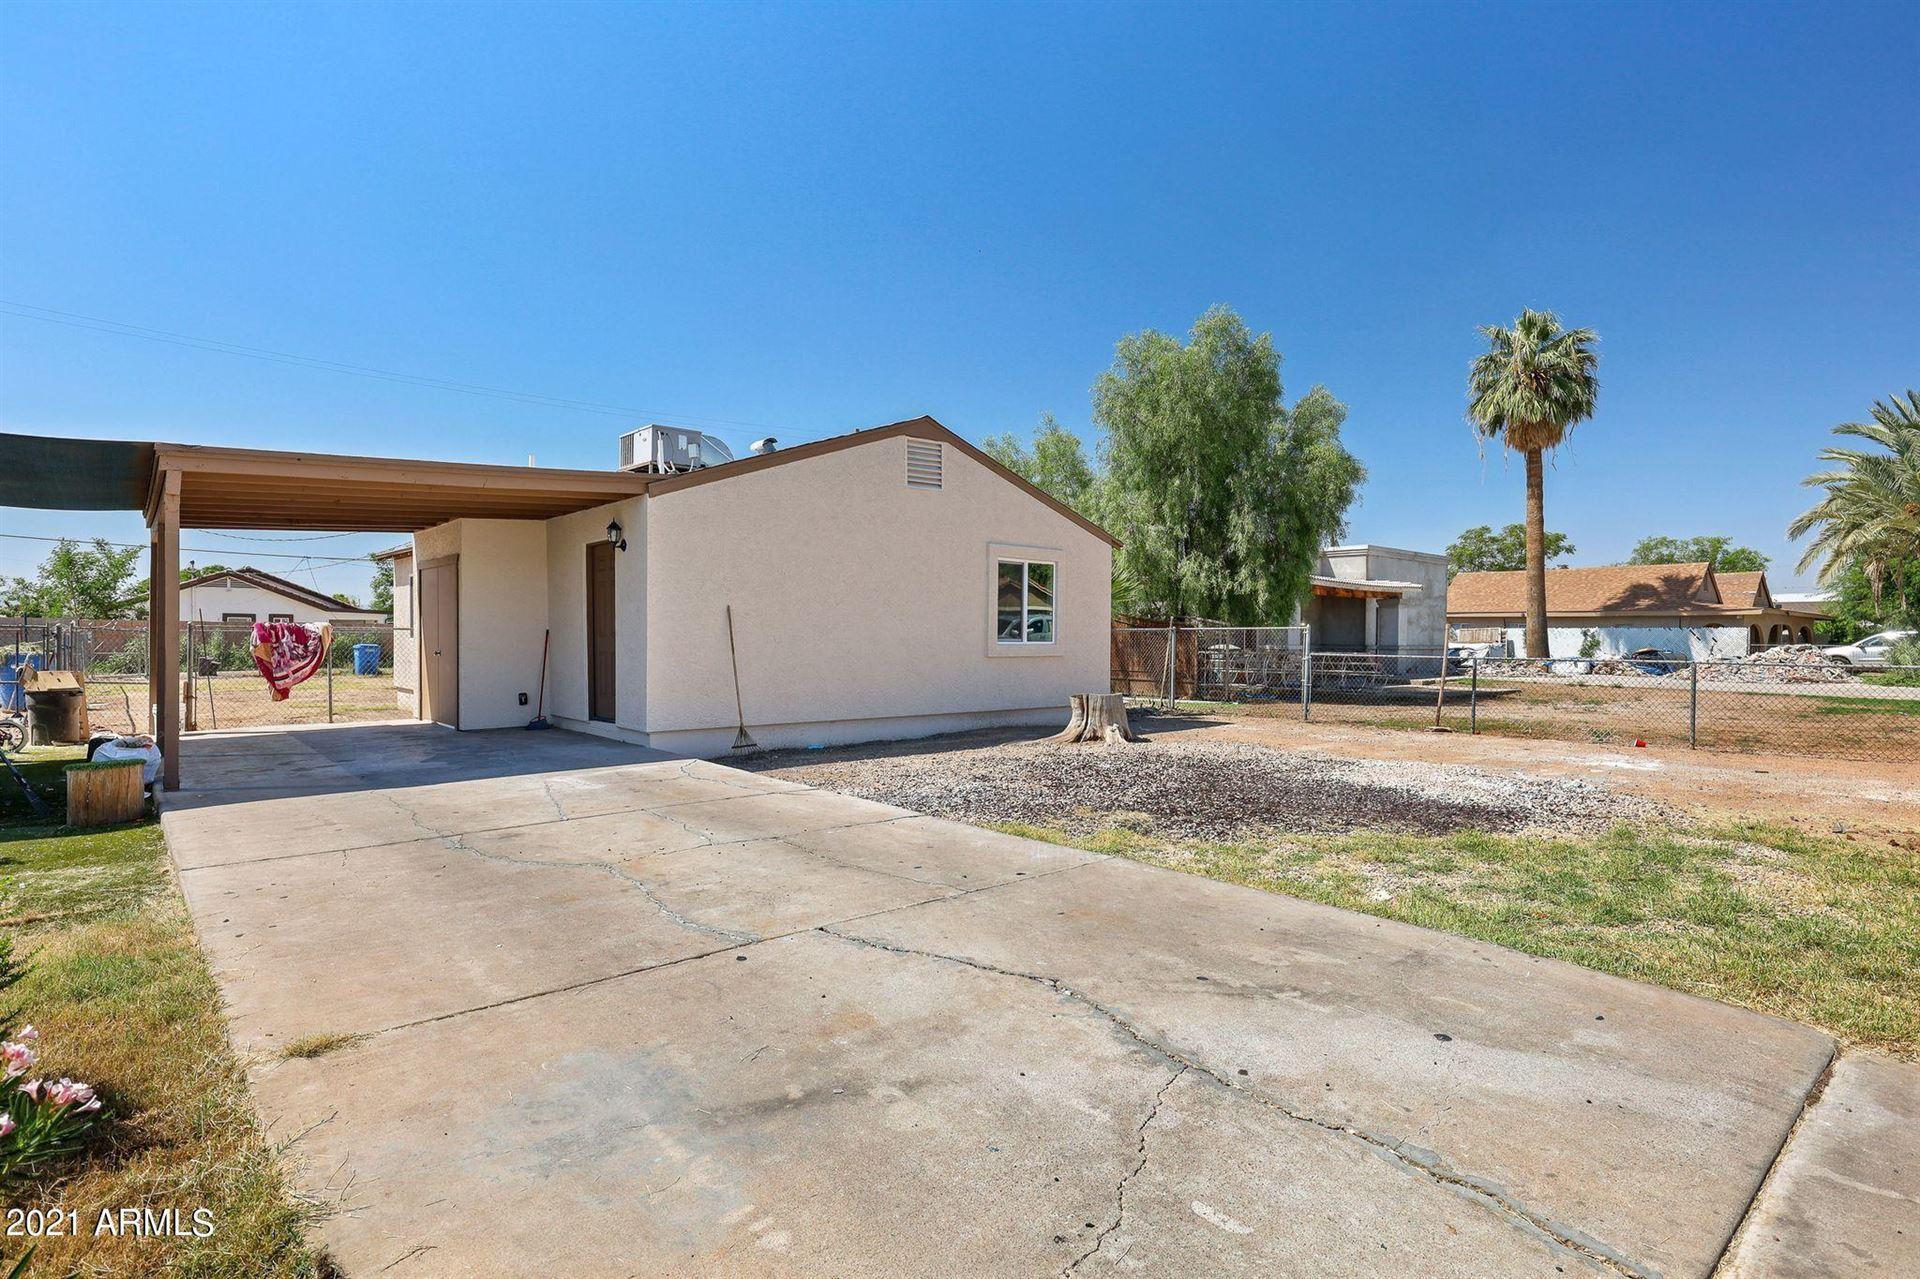 3617 W MCKINLEY Street, Phoenix, AZ 85009 - MLS#: 6283389